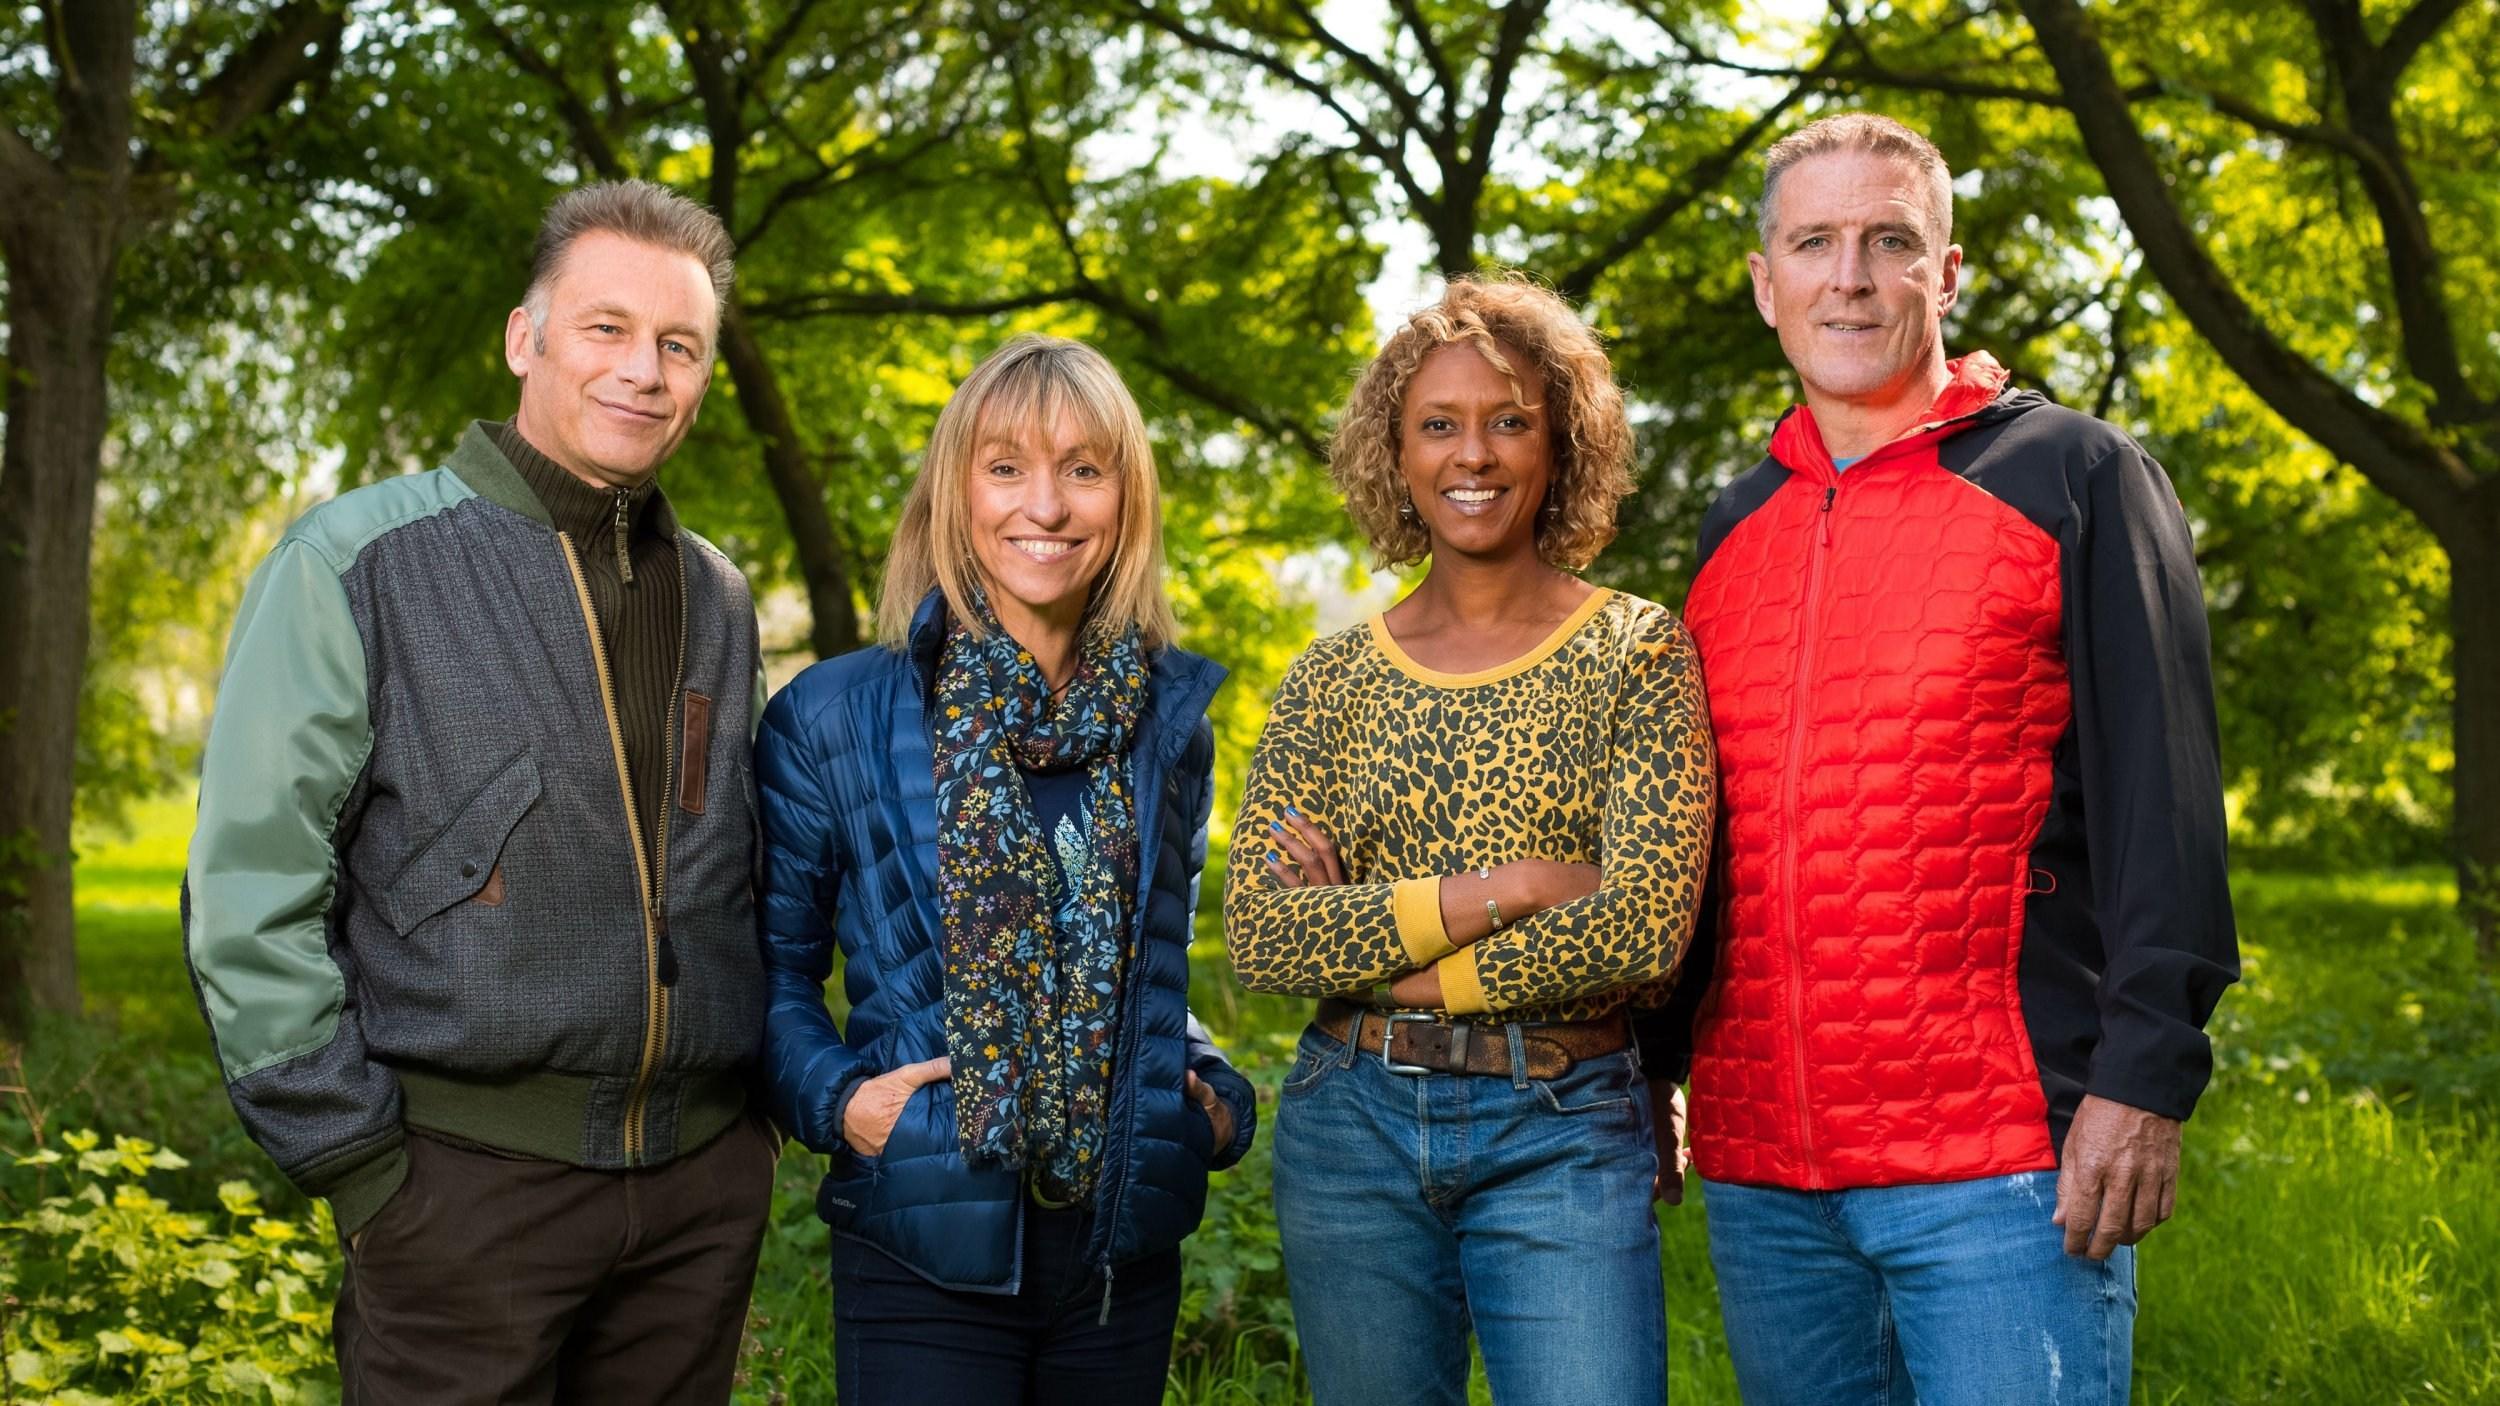 BBC 'determined' to air Spring Watch despite coronavirus lockdown